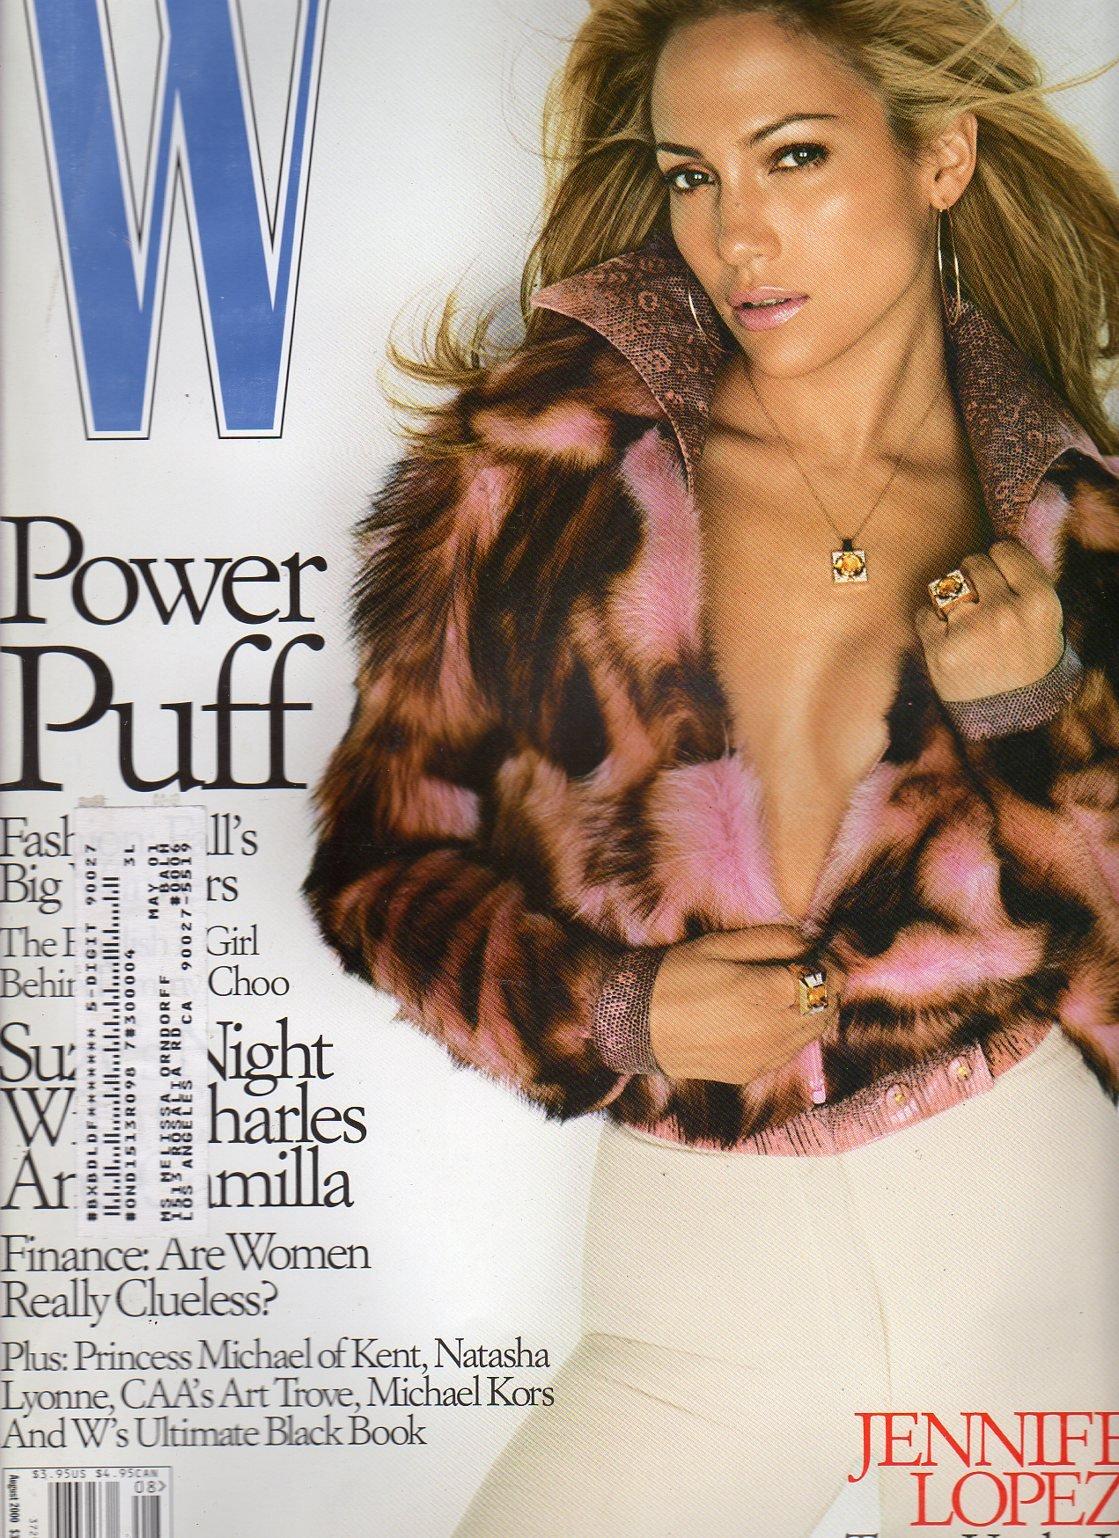 W Fashion Magazine August 2000 (JENNIFER LOPEZ)